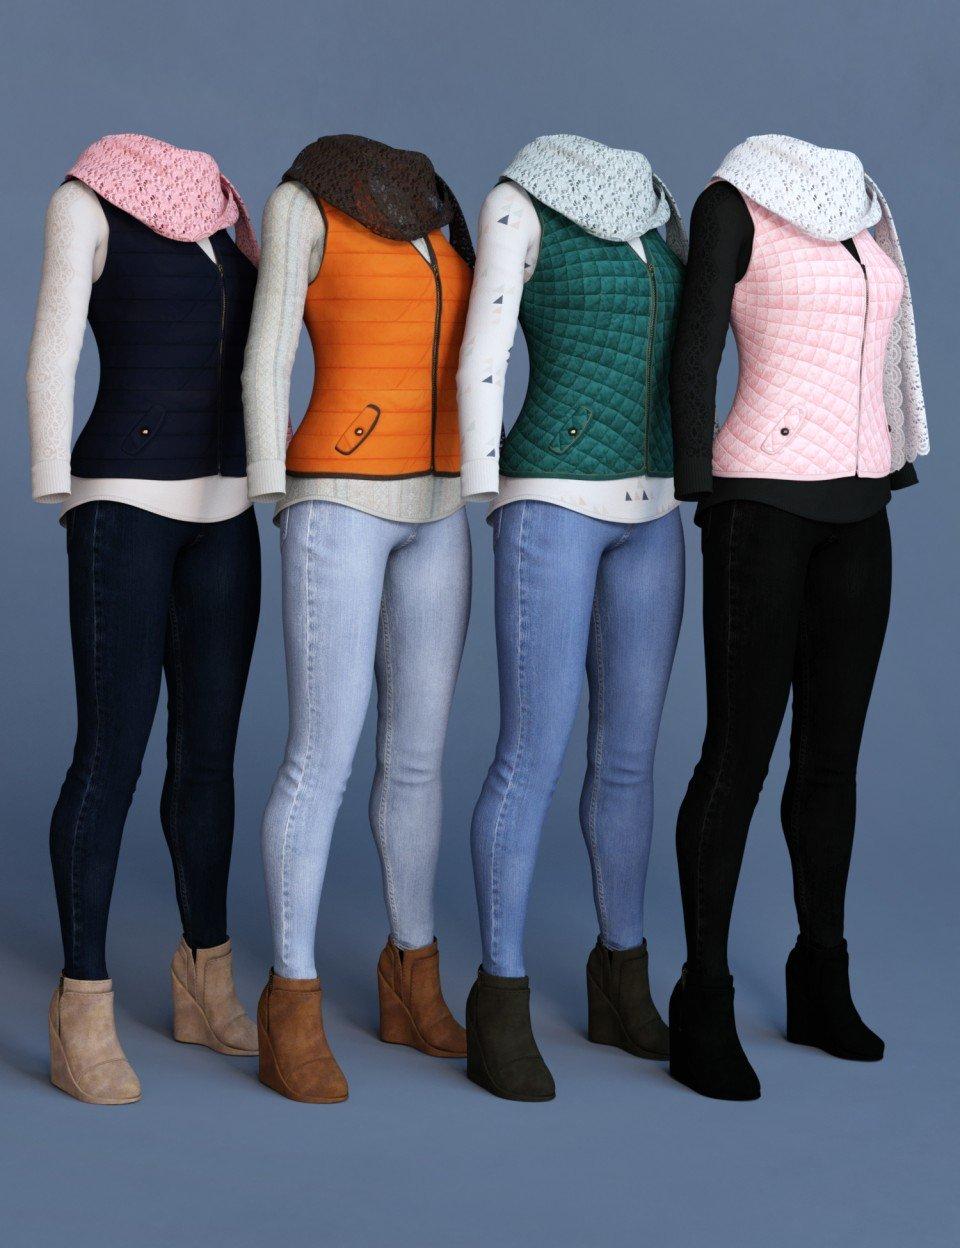 dForce Latte Mornings Outfit Textures_DAZ3D下载站